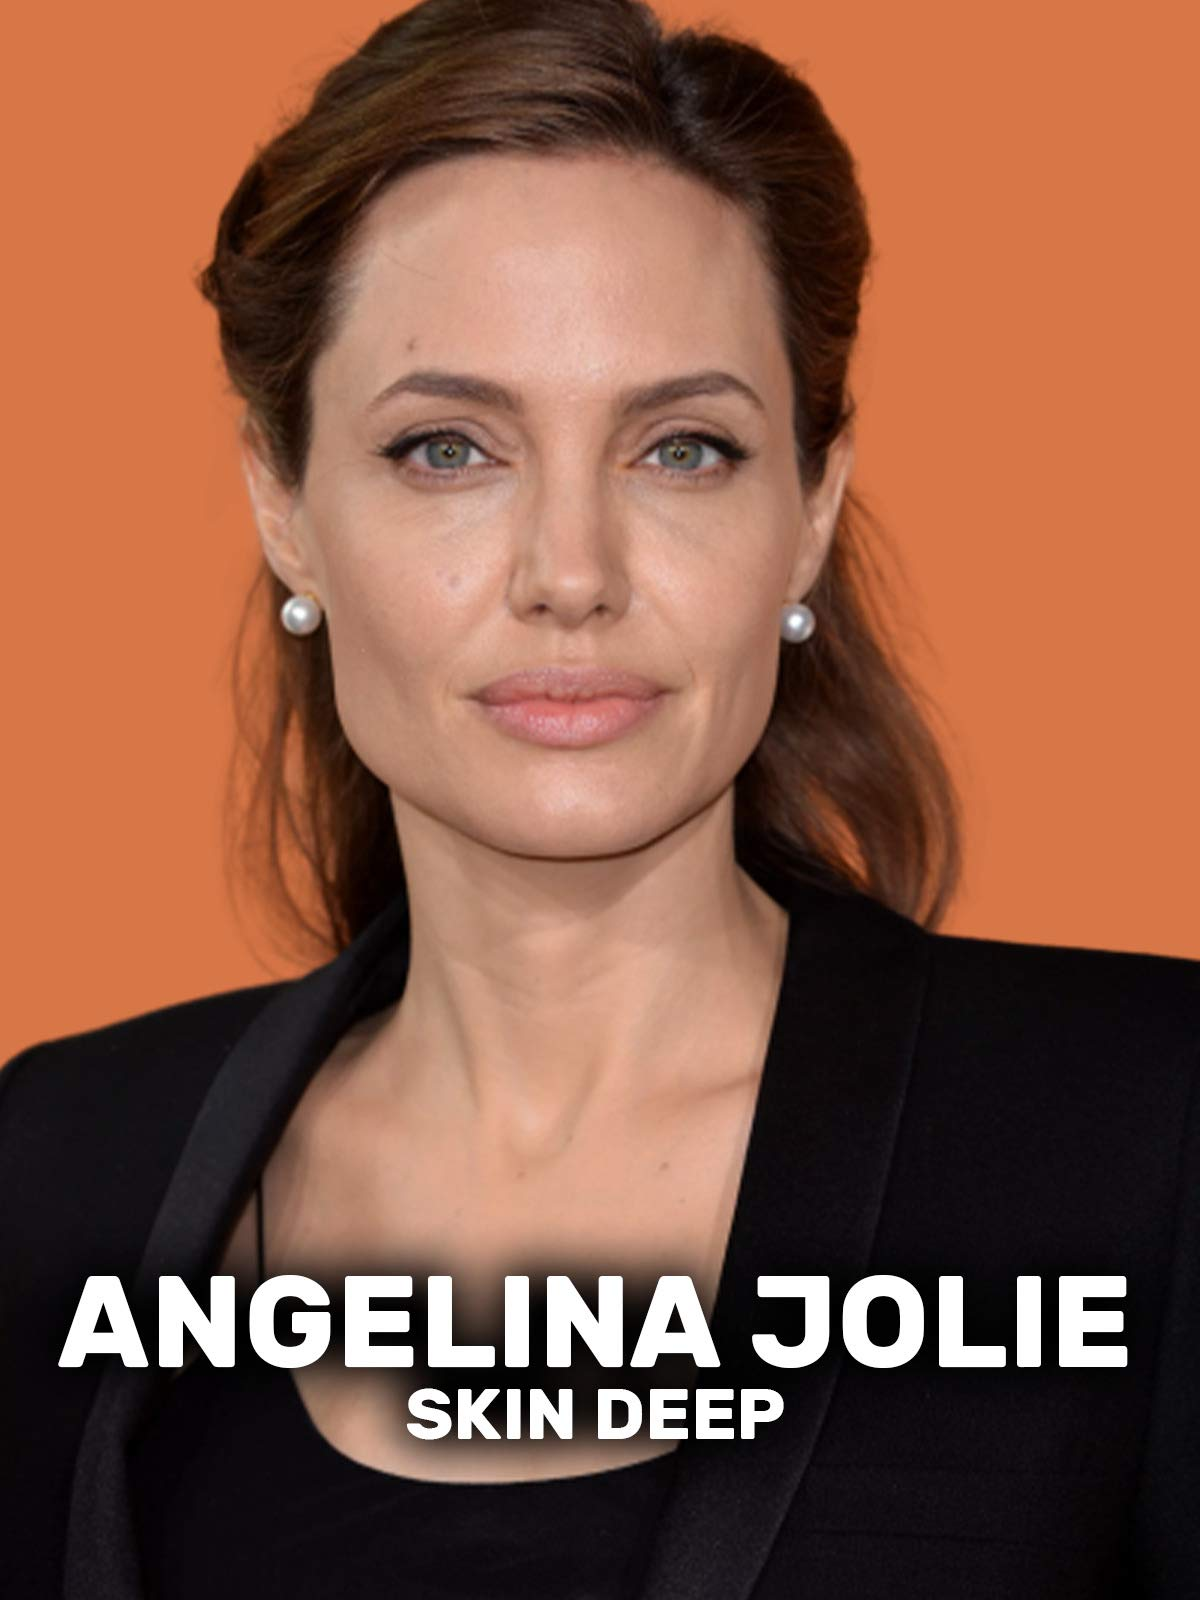 Angelina Jolie: Skin Deep